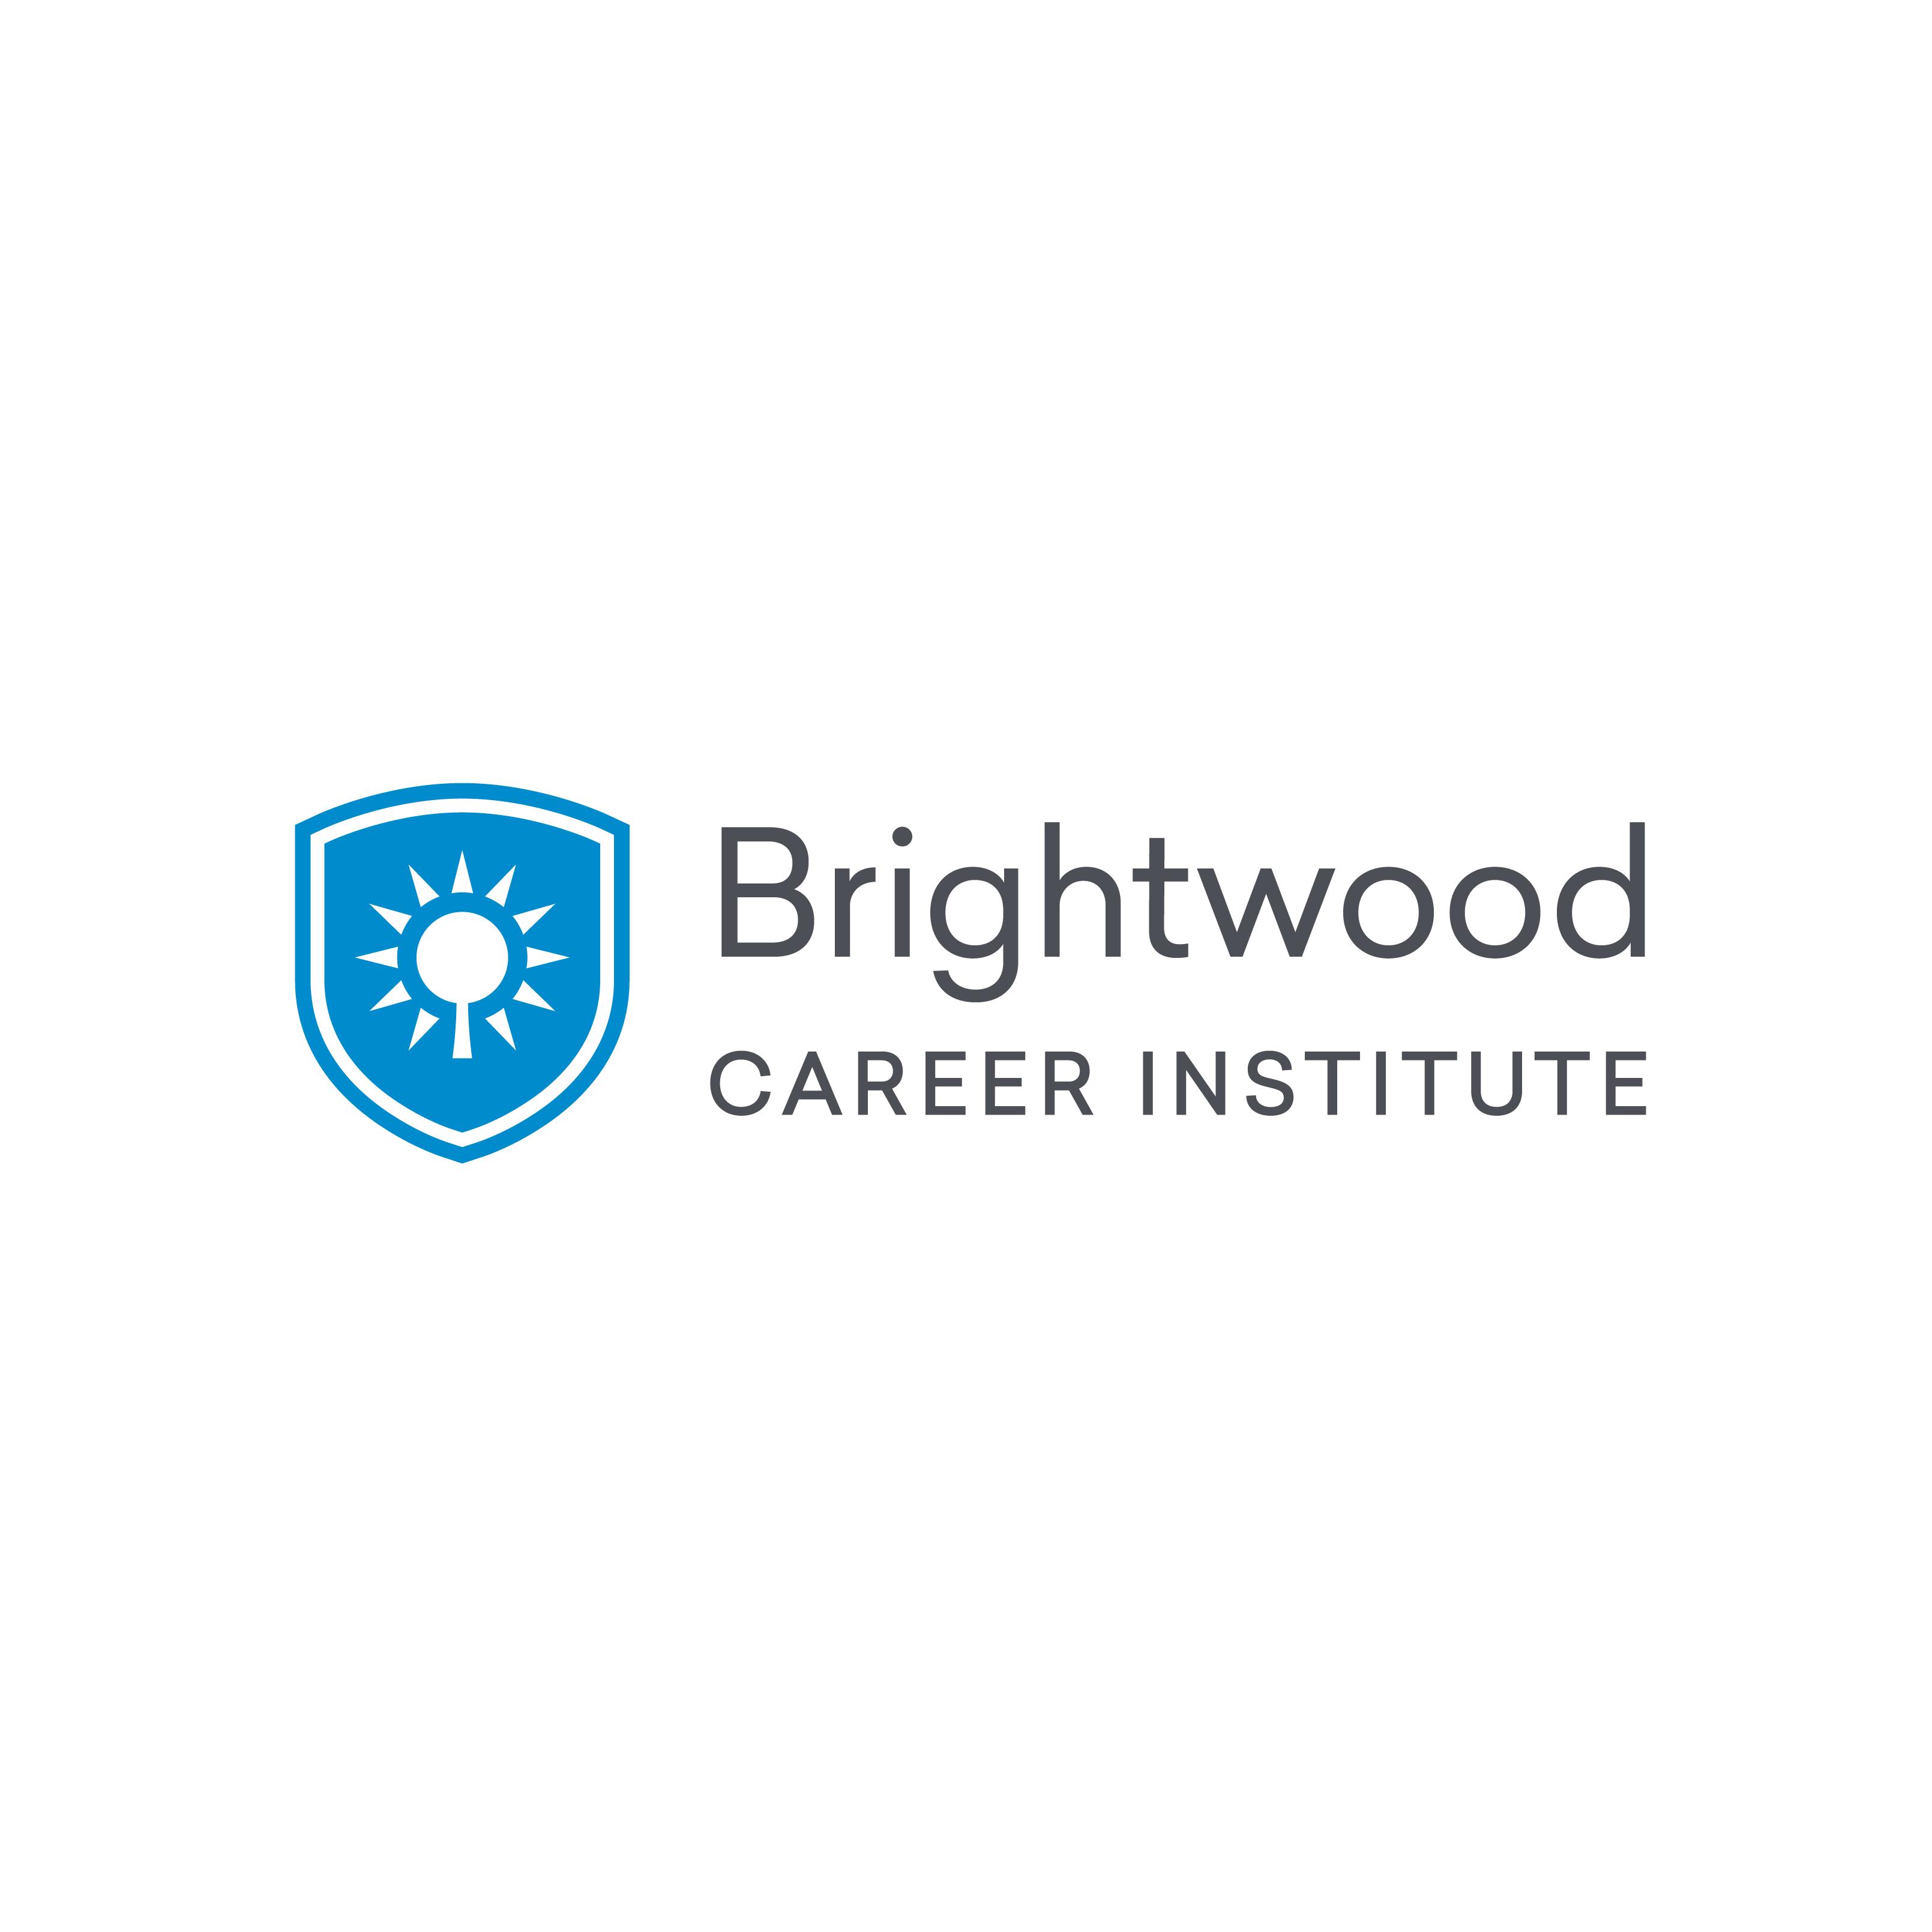 Brightwood Career Institute in Pittsburgh